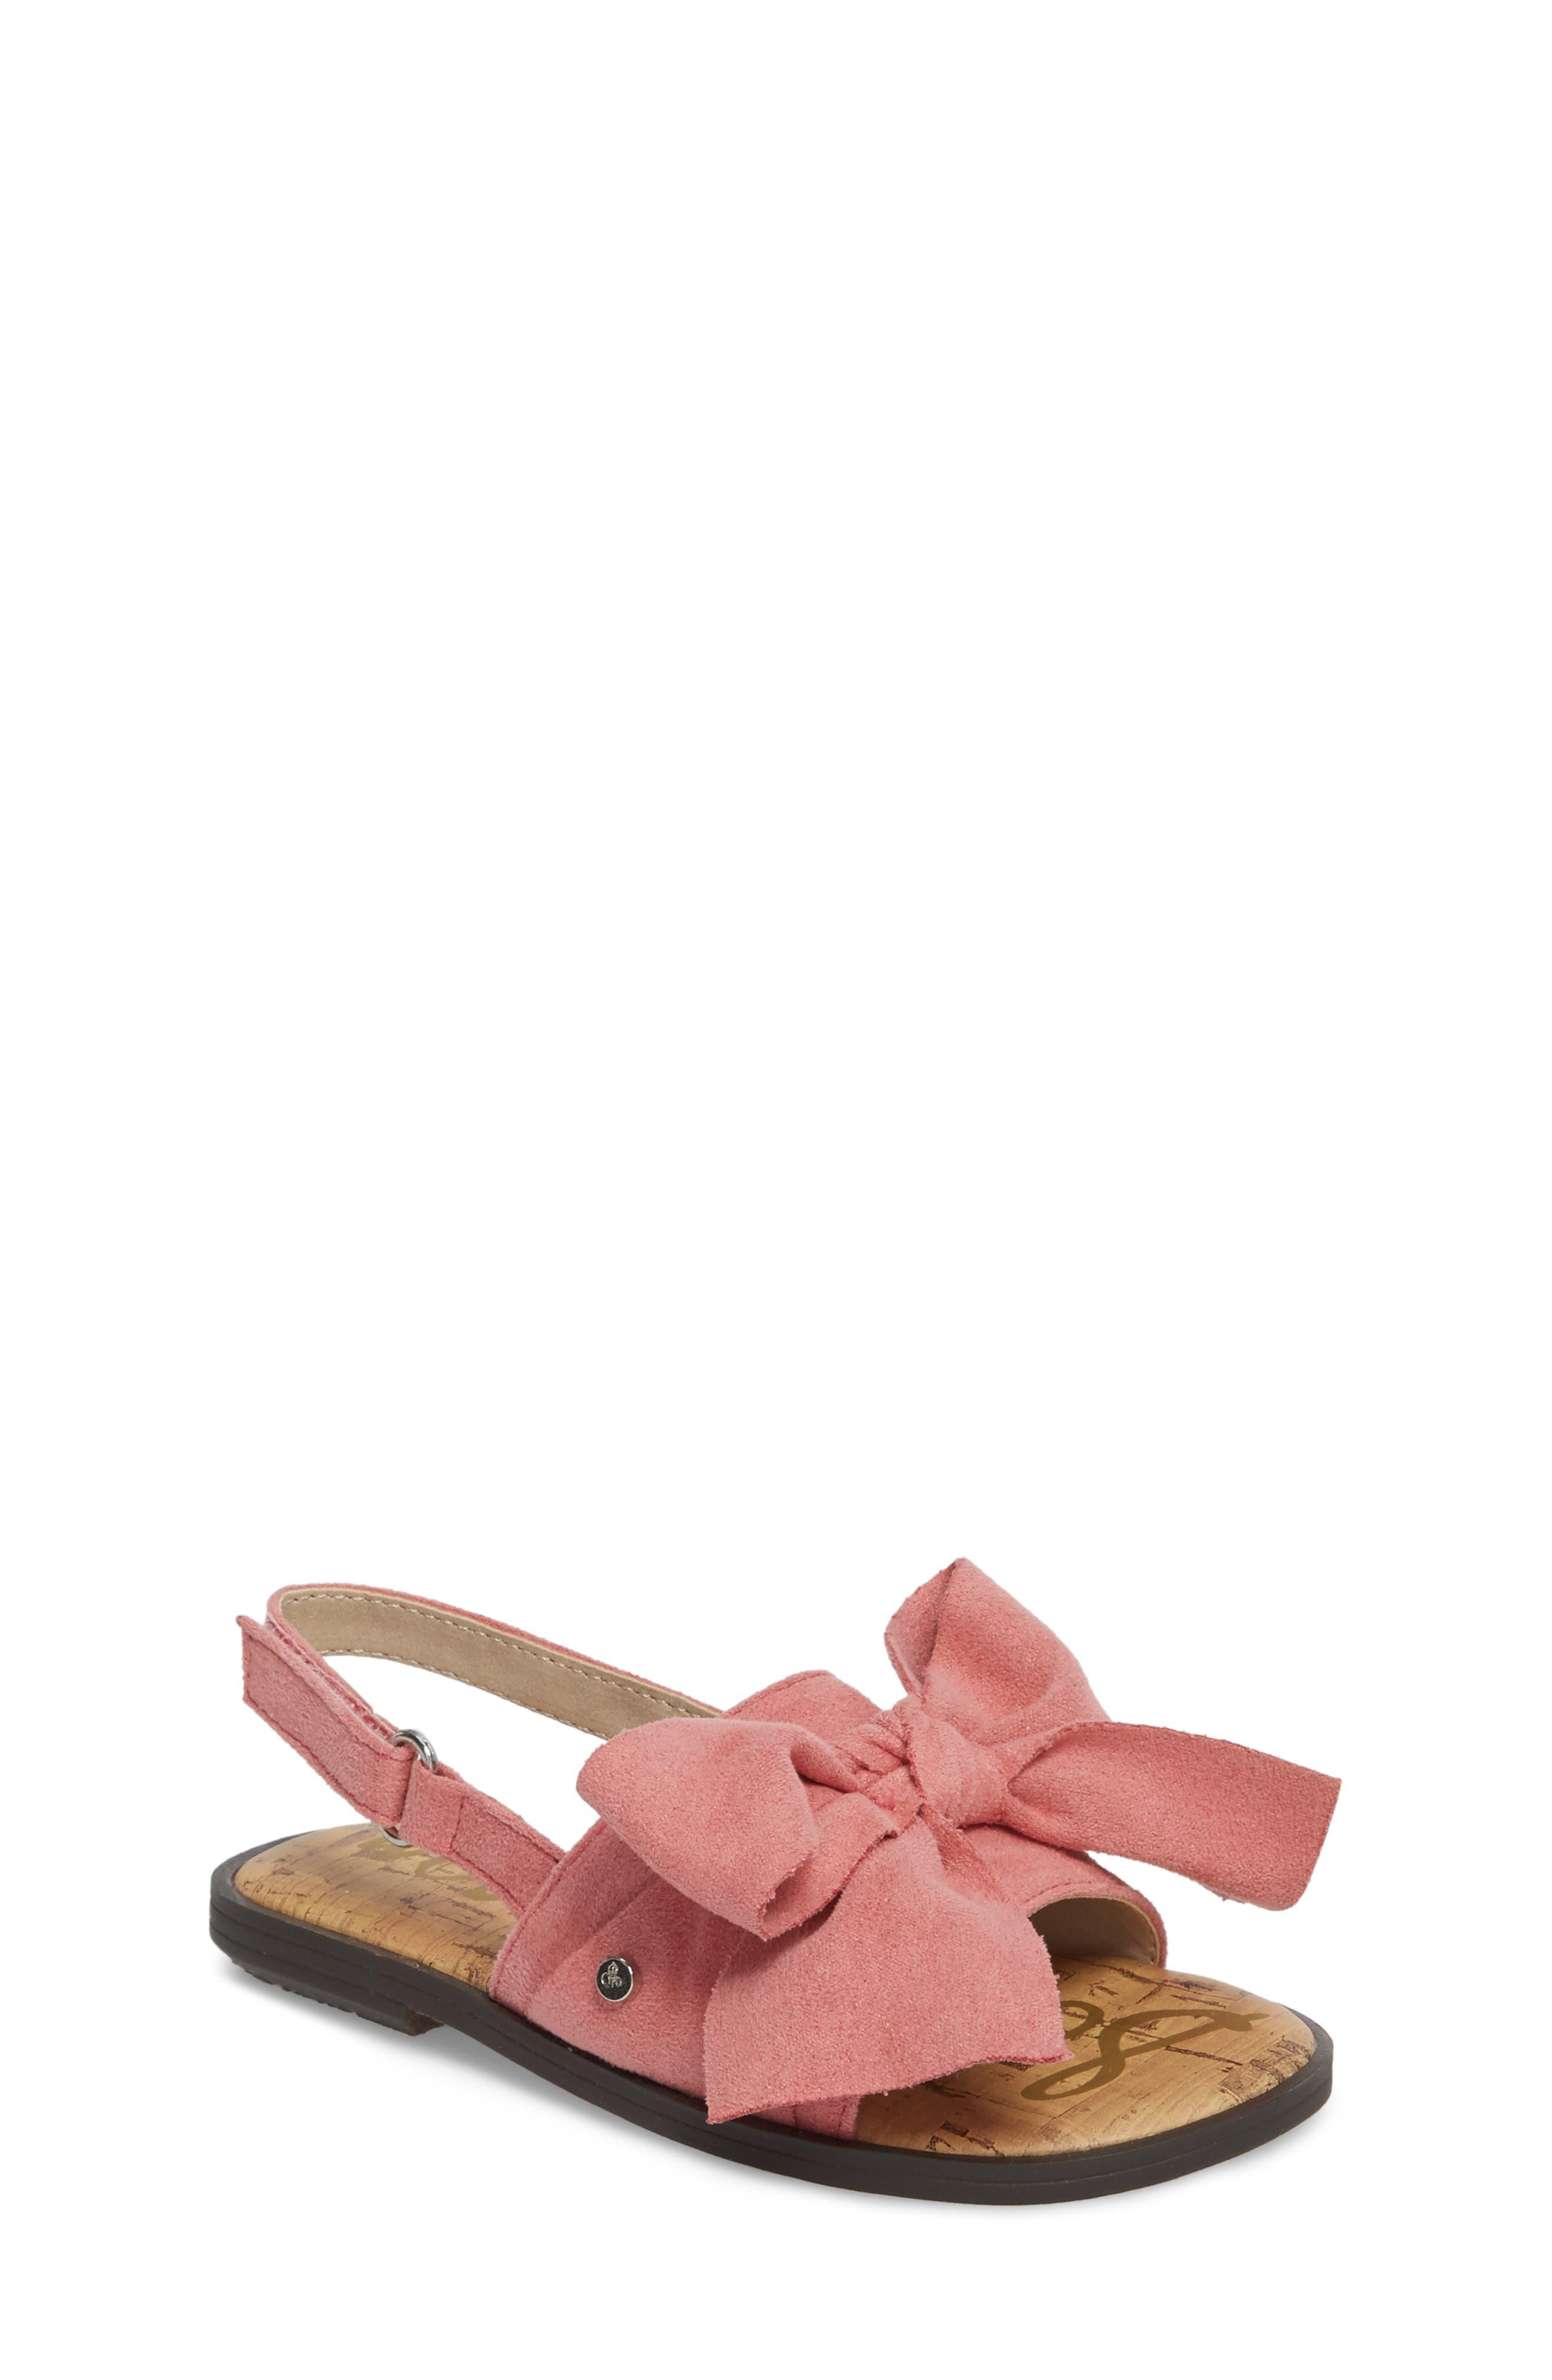 Gigi Bow Sandal,                         Main,                         color, 697